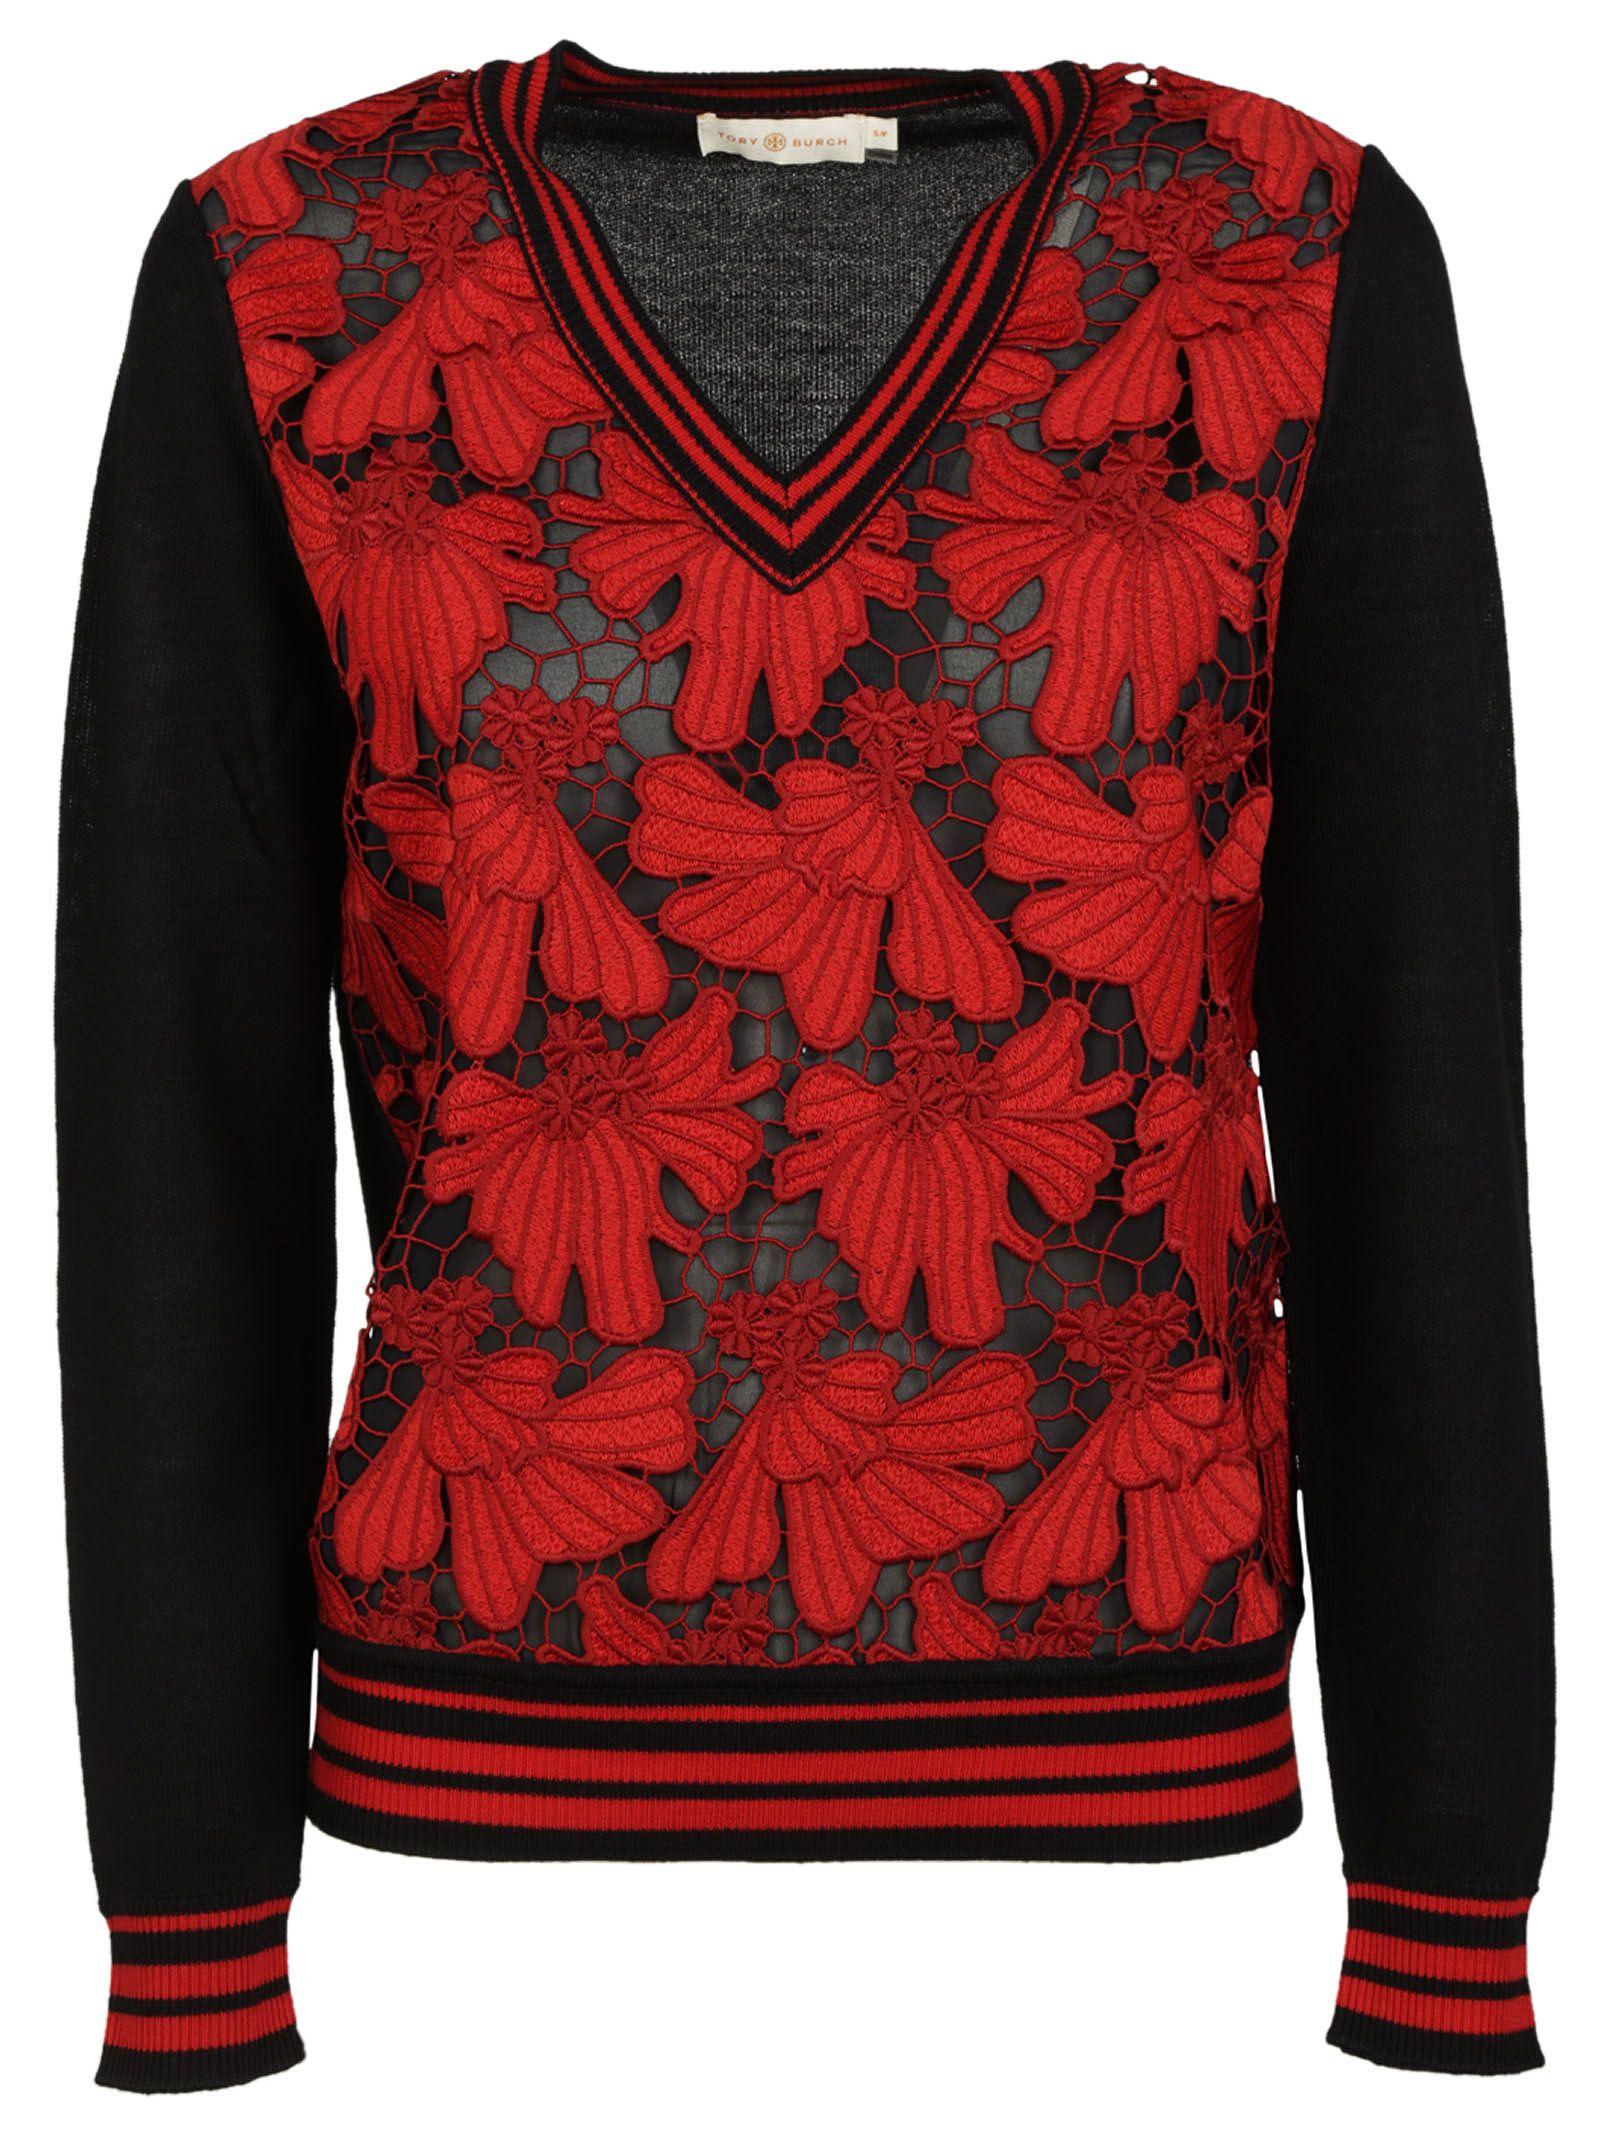 Tory Burch Nicola Sweater